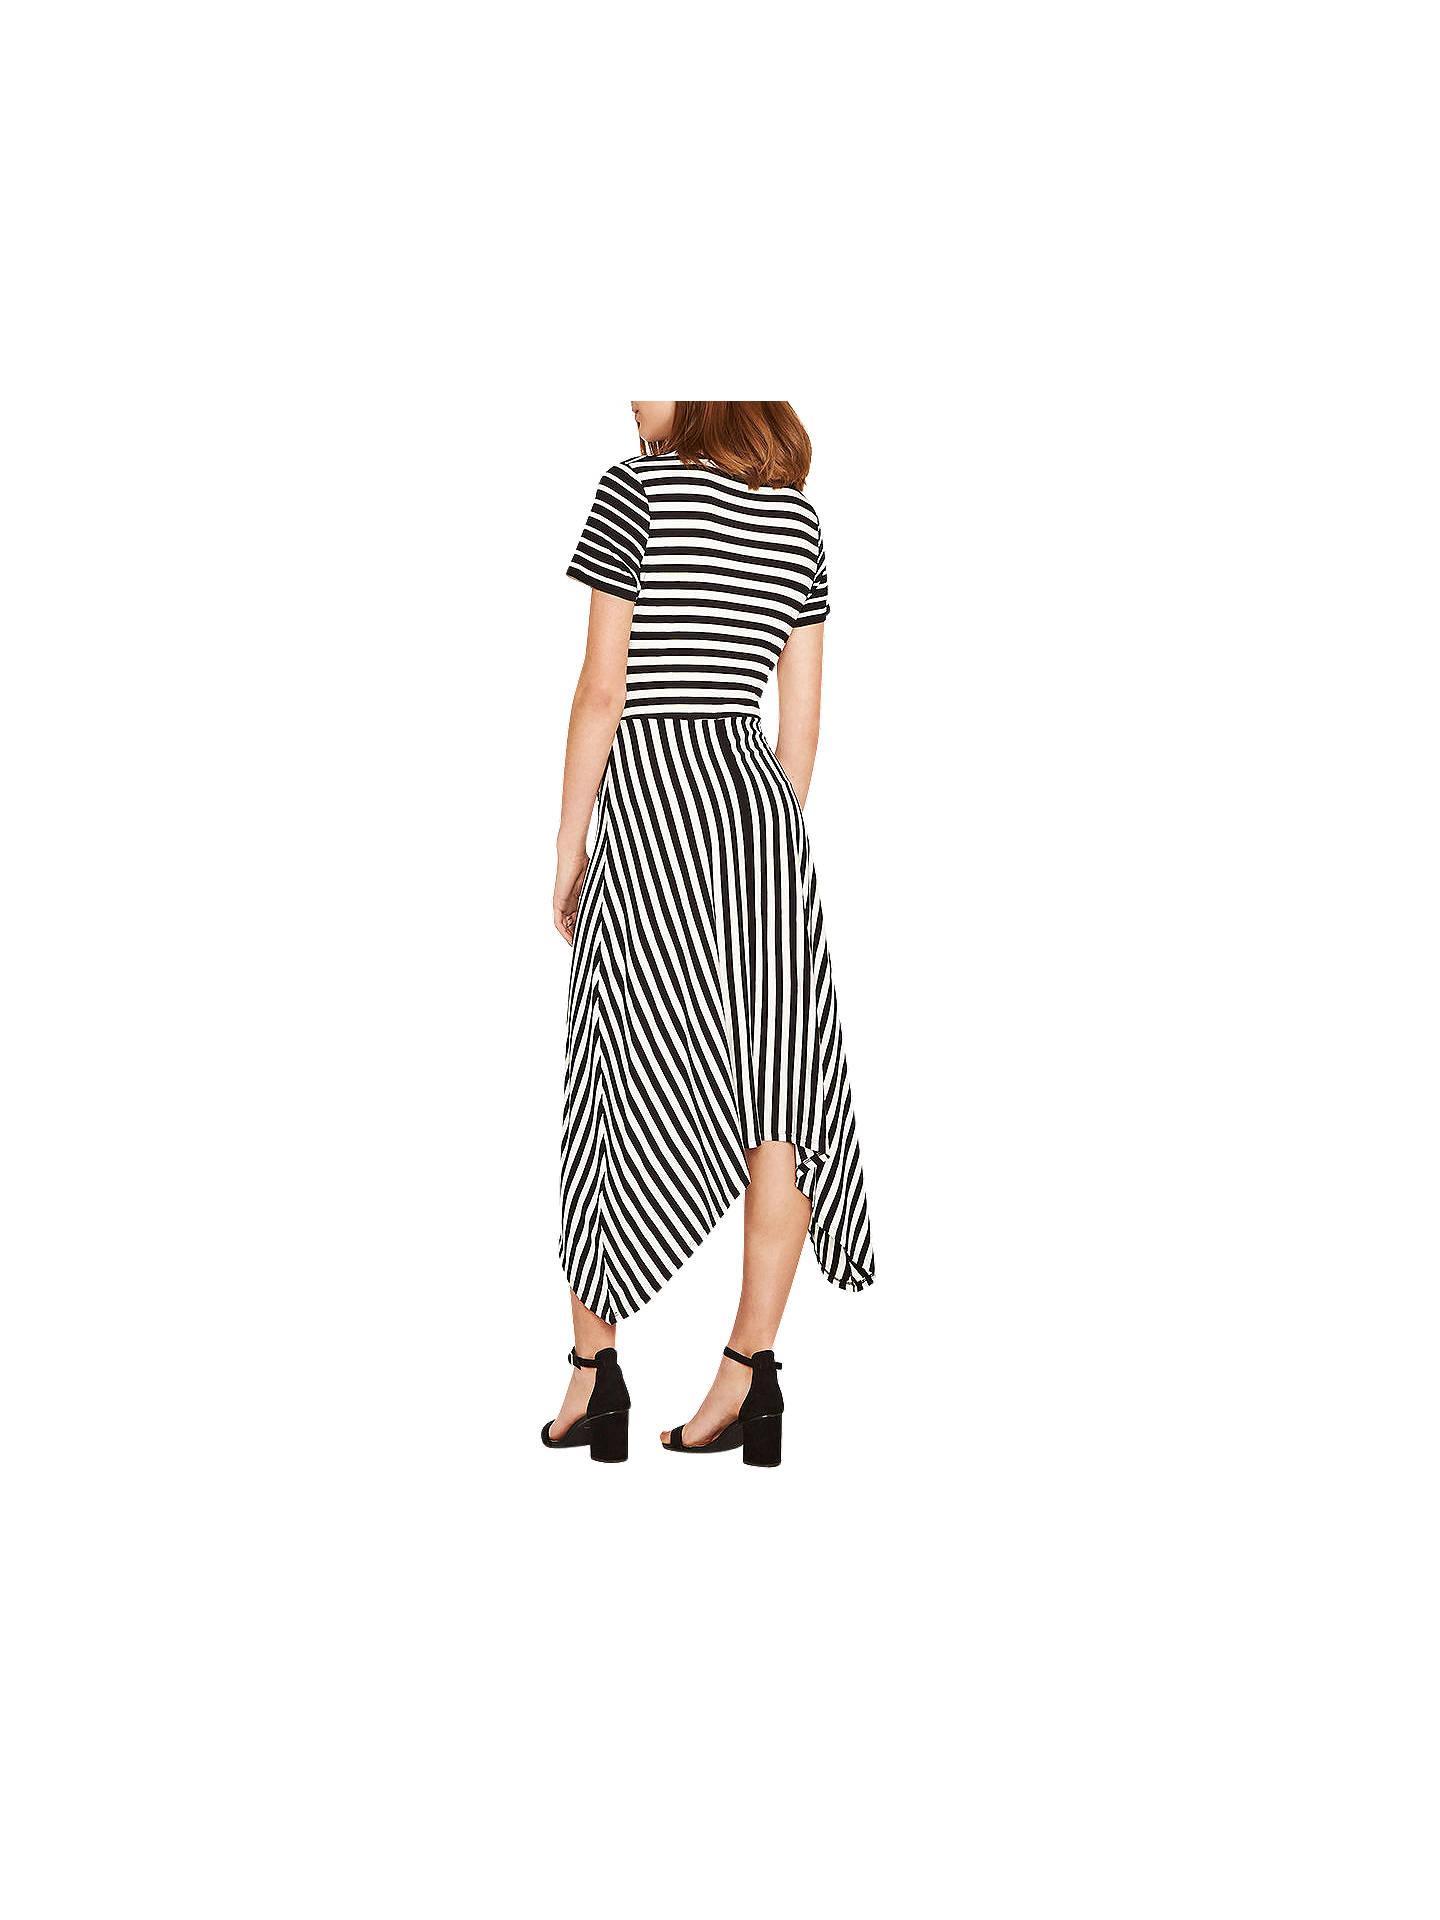 fe54865ab89b ... Buy Oasis Asymmetric Striped Dress, Black/White, XS Online at  johnlewis.com ...